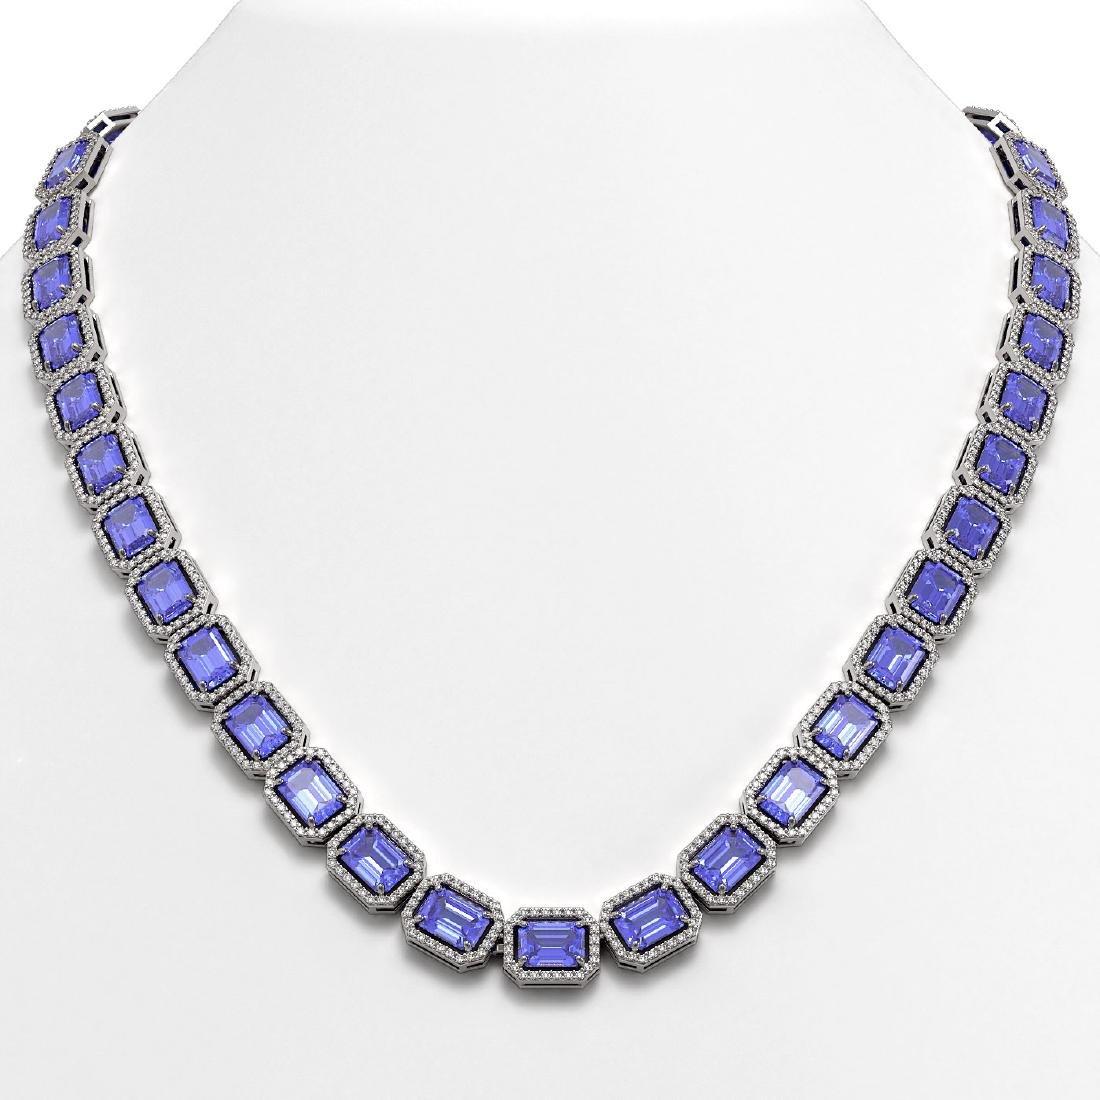 56.69 CTW Tanzanite & Diamond Halo Necklace 10K White